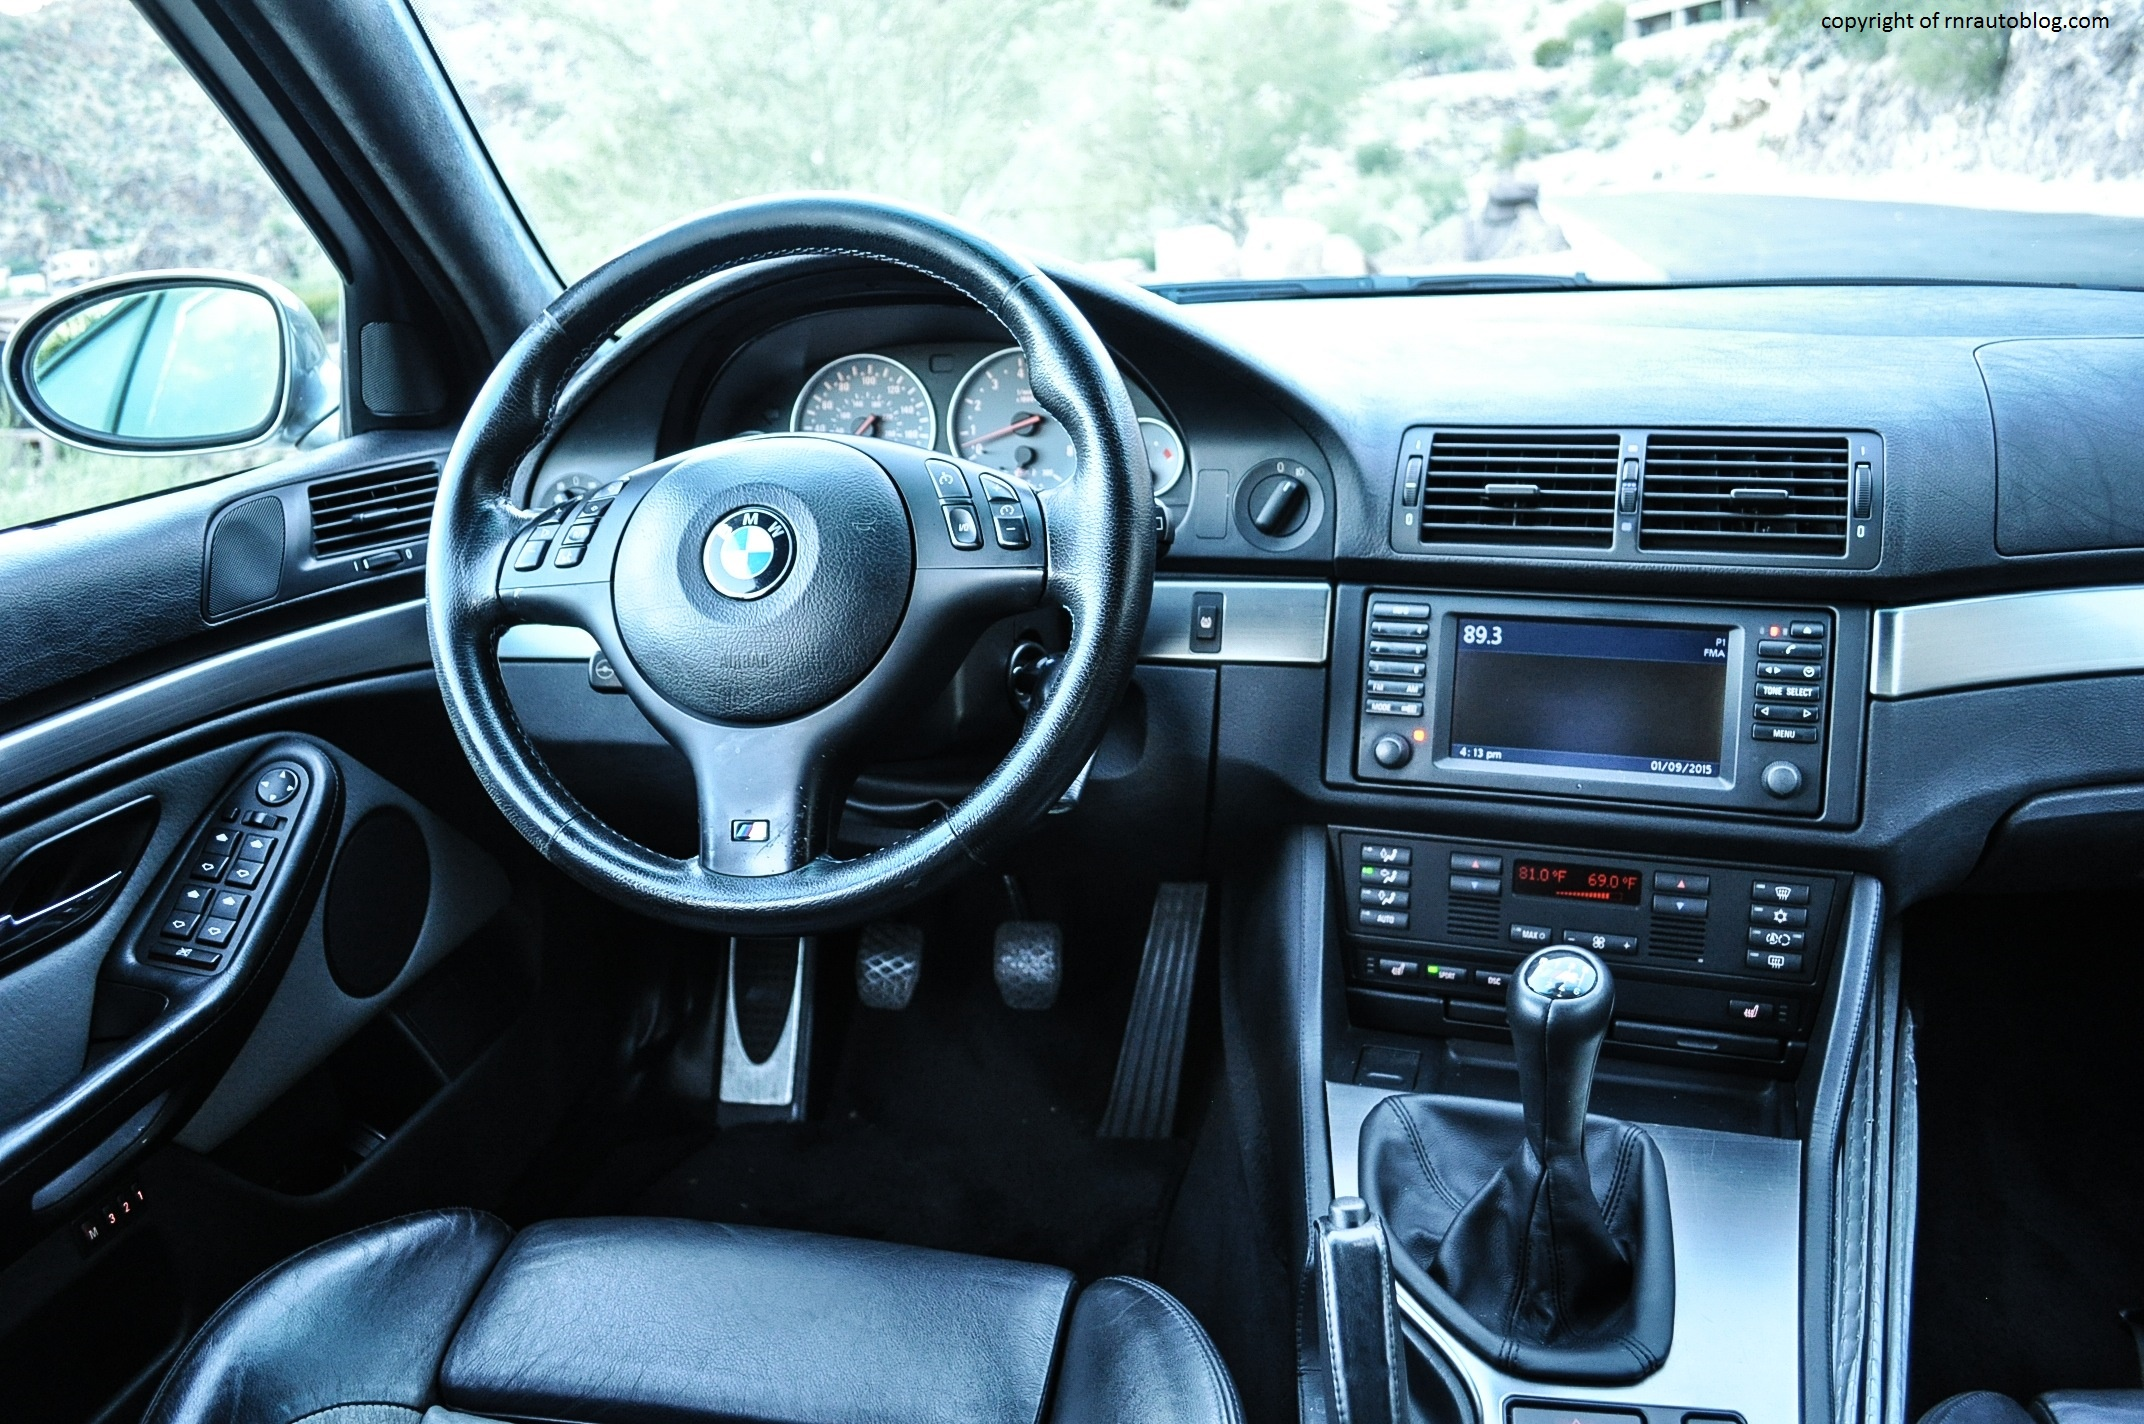 bmw m5 2001 interior